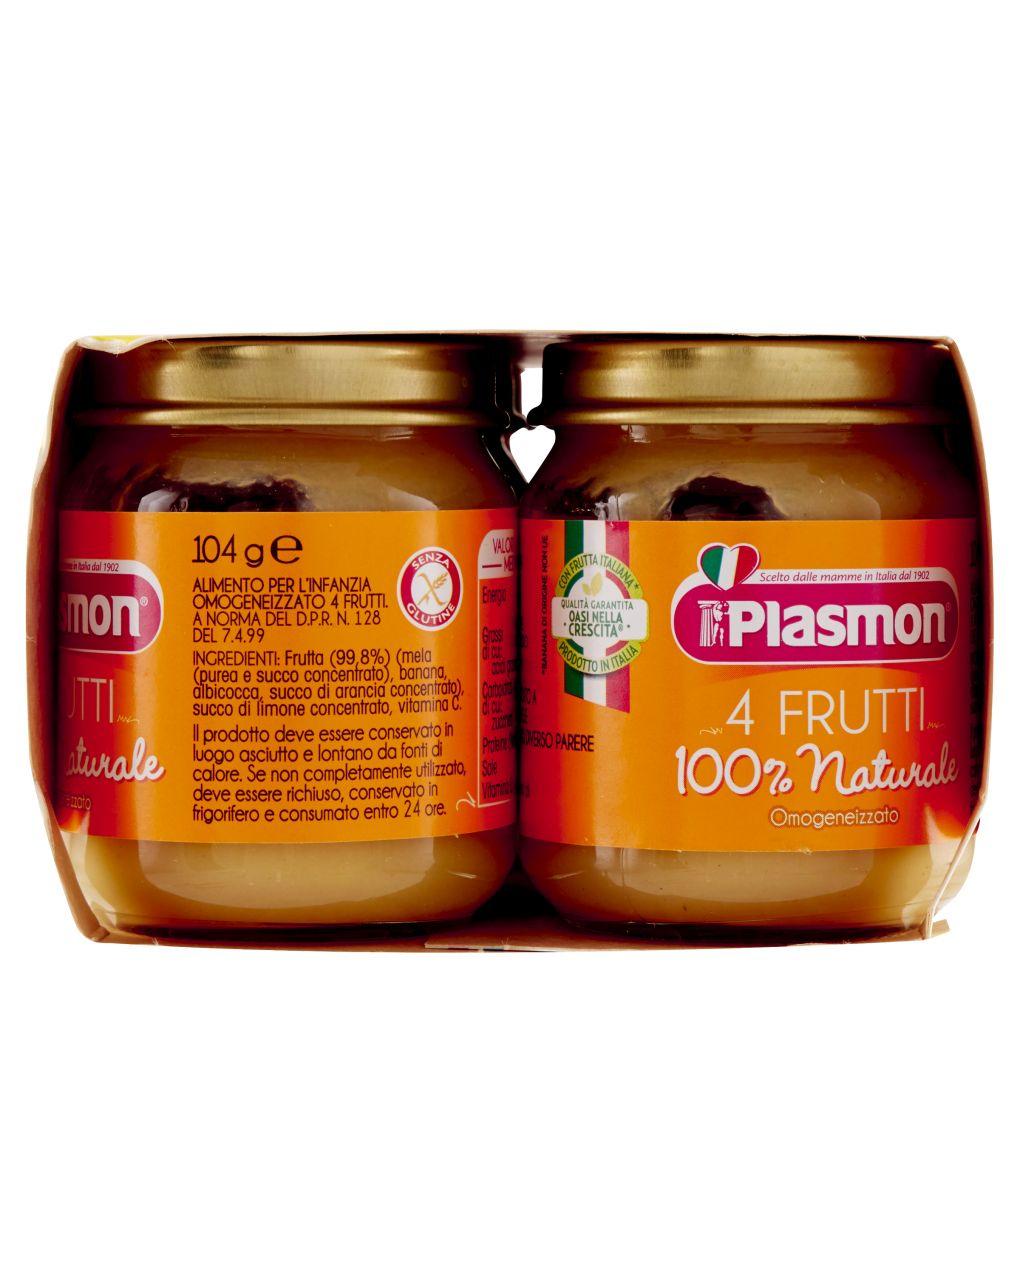 Plasmon - omogeneizzato 4 frutti 6x104g - Plasmon